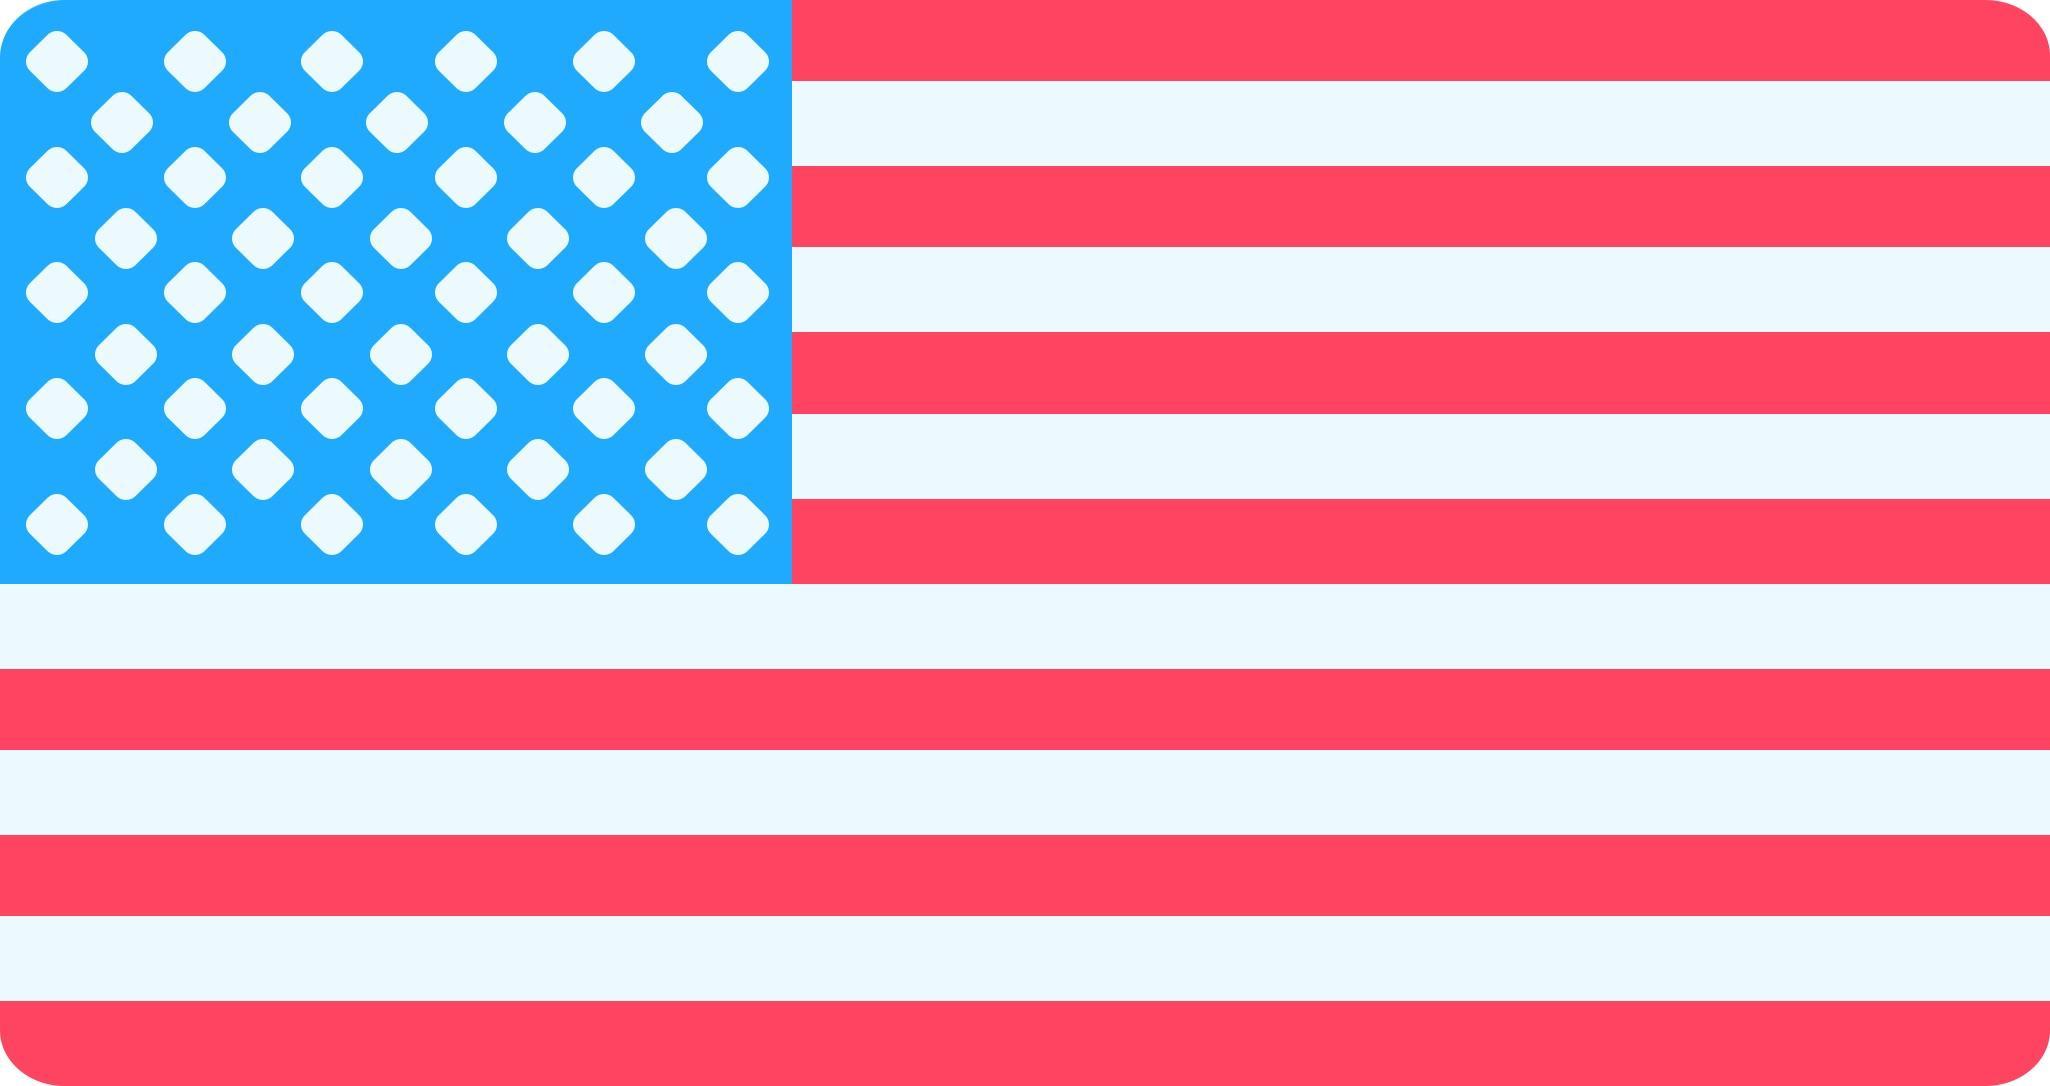 2050x1086 My Take On A Minimalist Us Flag Vexillology